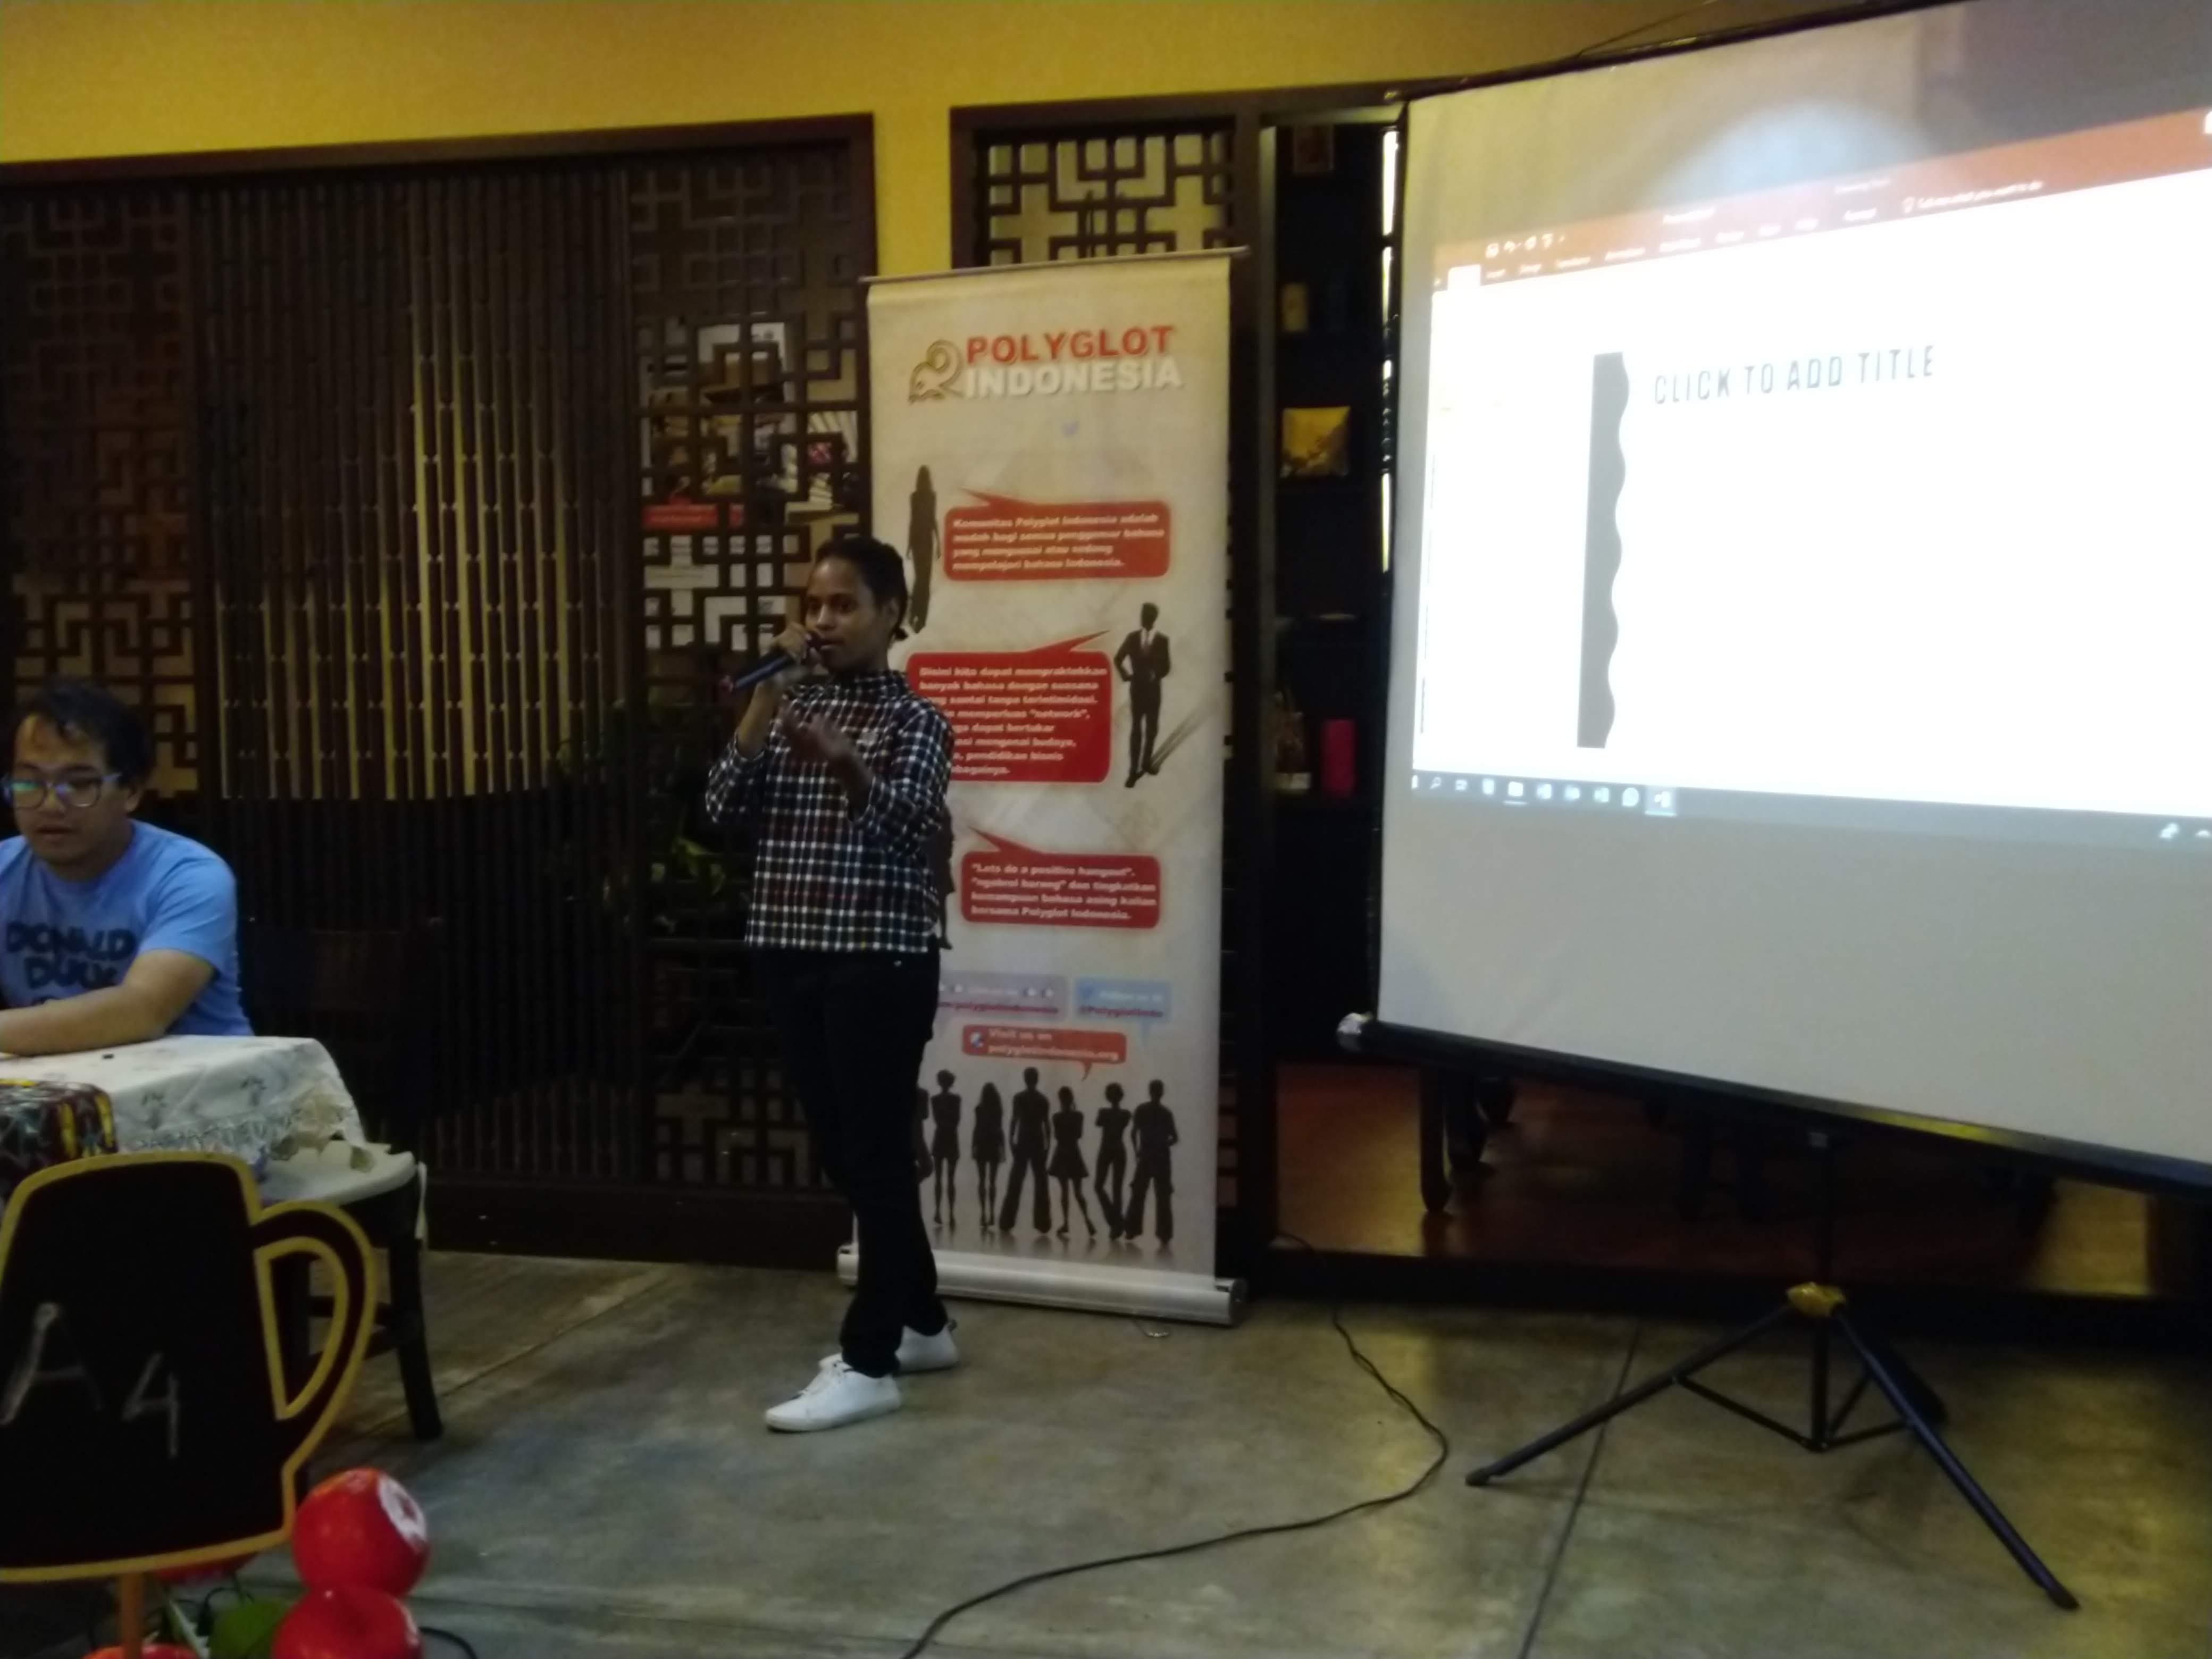 Naomi saat memperkenalkan bahasa Nggalik pada para peserta | Foto: Aditya Jaya/GNFI